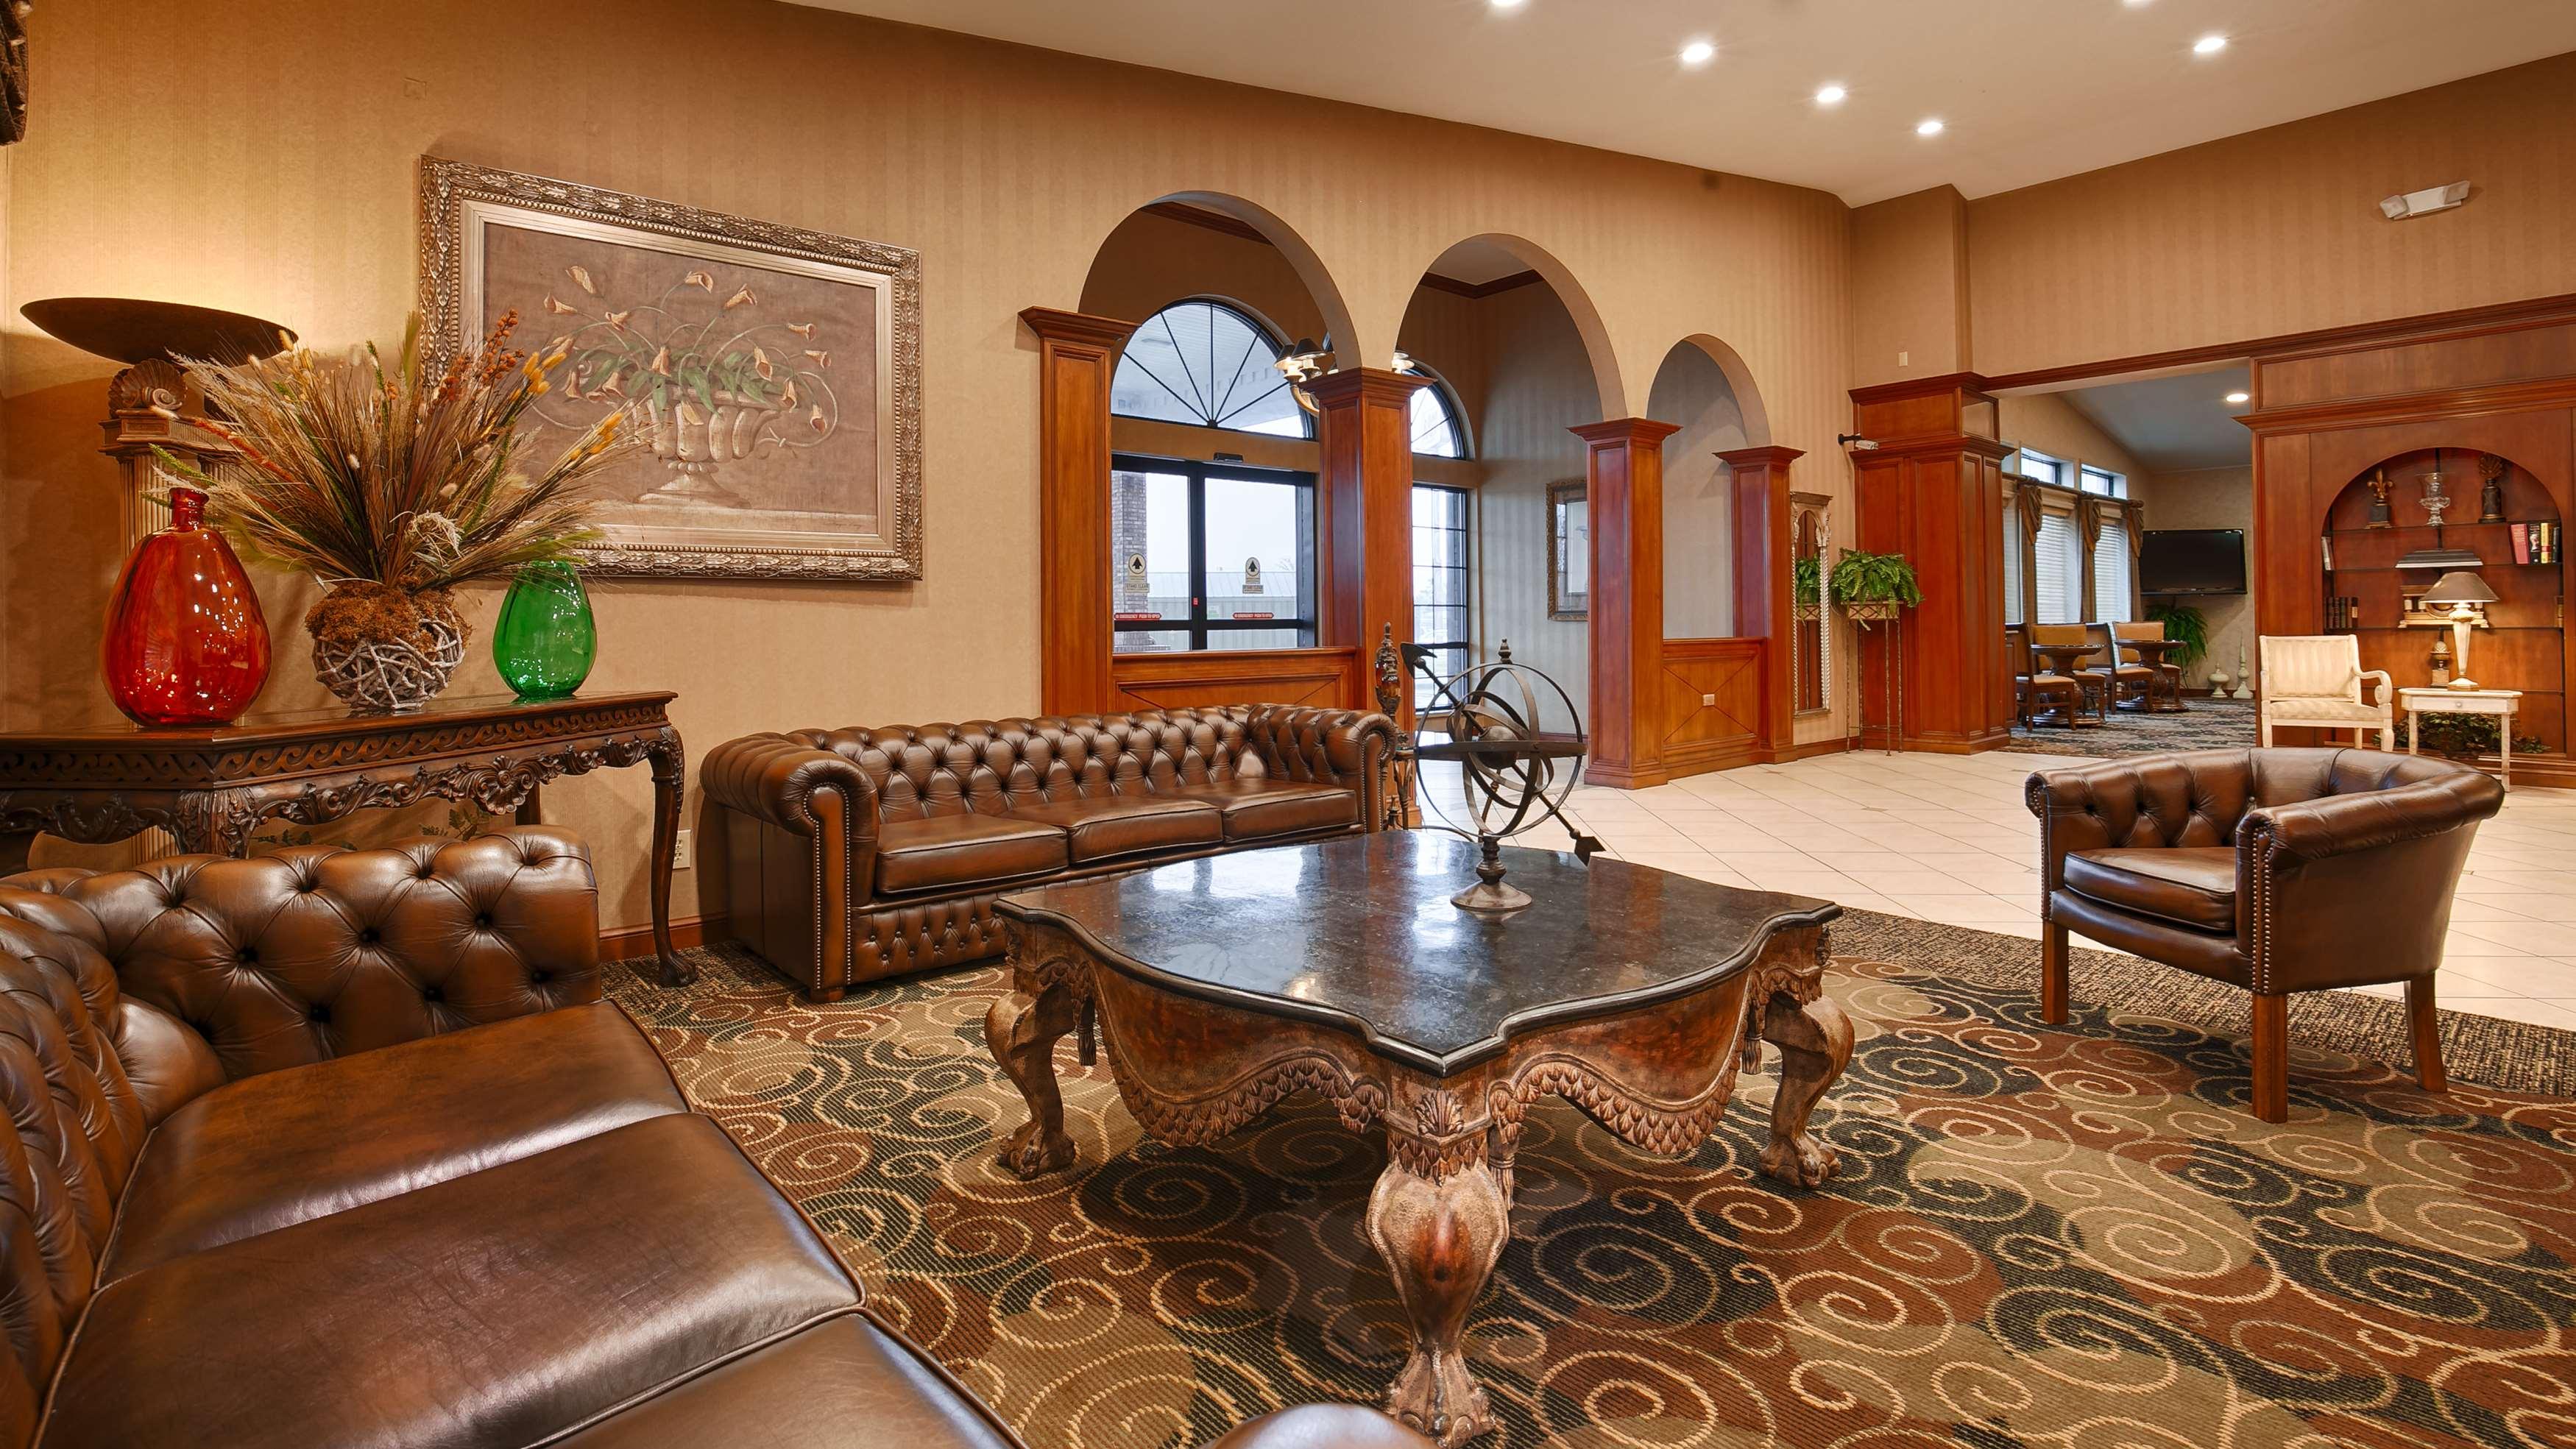 Best Western Plus Bessemer Hotel & Suites image 1